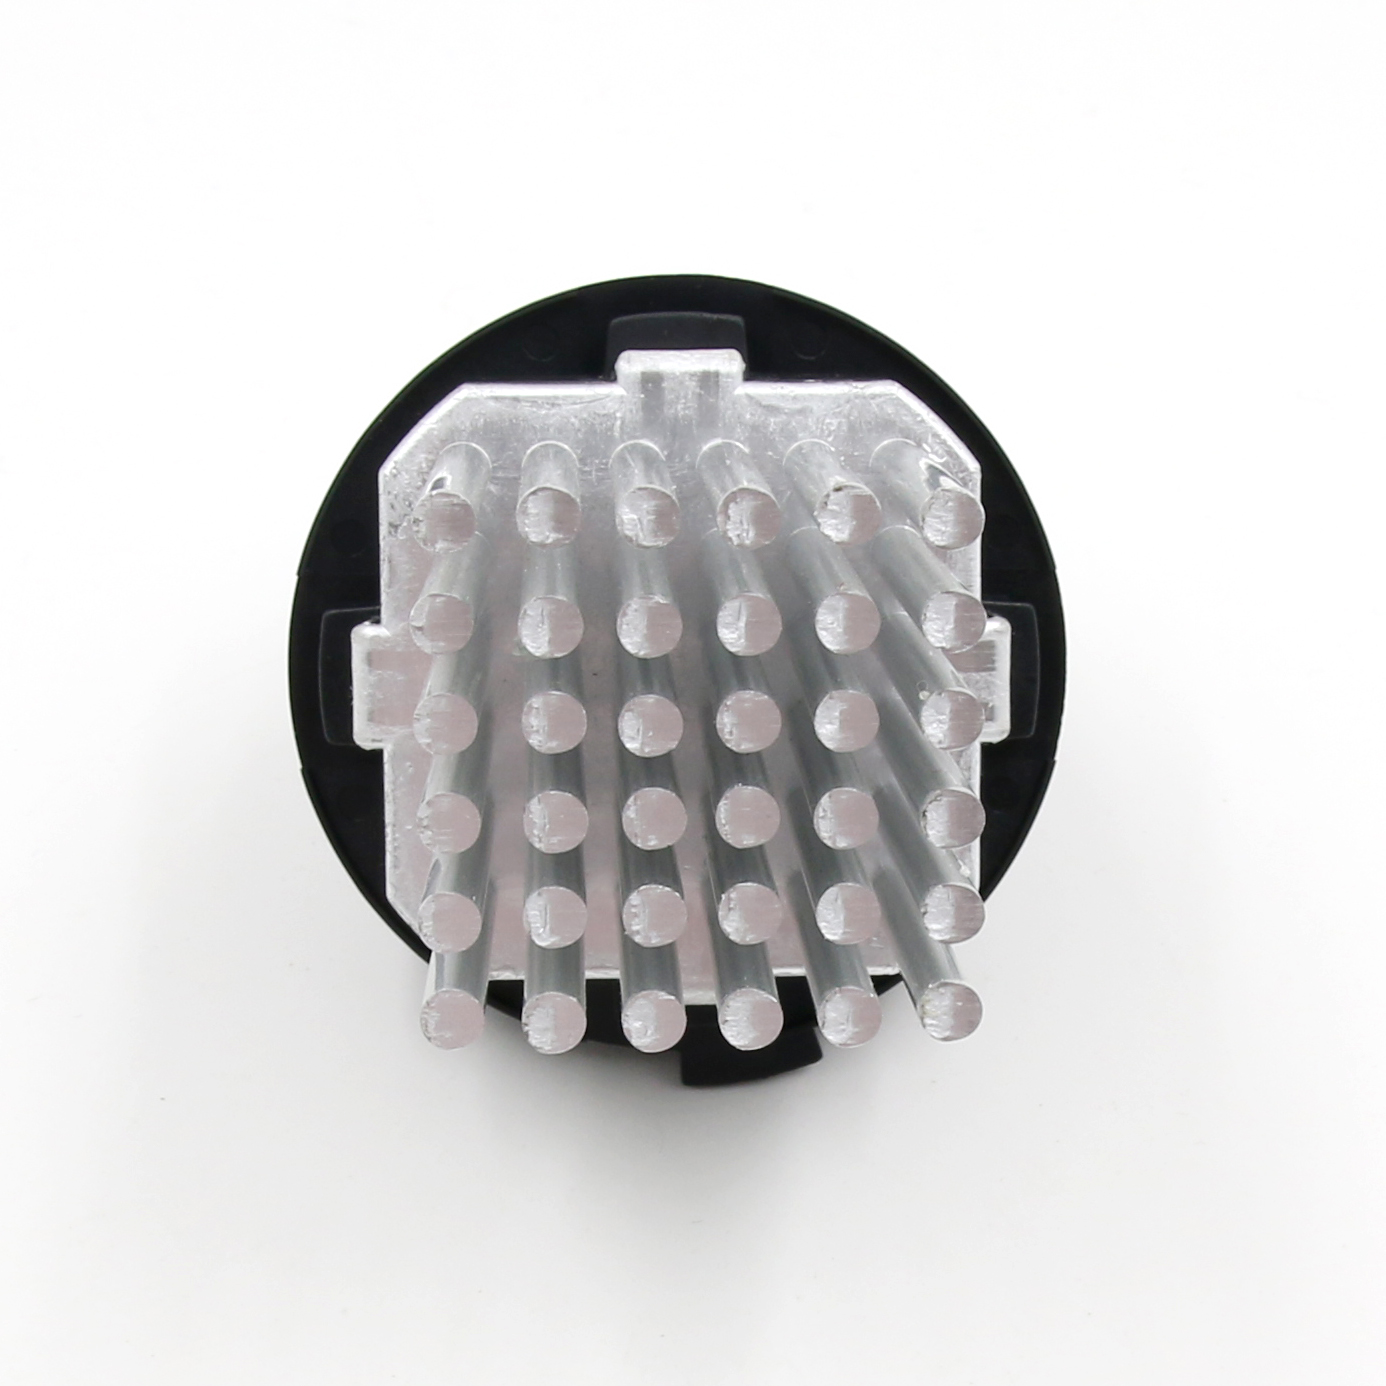 KIMISS Blower Resistor Motor,A//C Heater Blower Motor Regulator Resistor Fit for Mercedes‑Benz Sprinter,2048707710